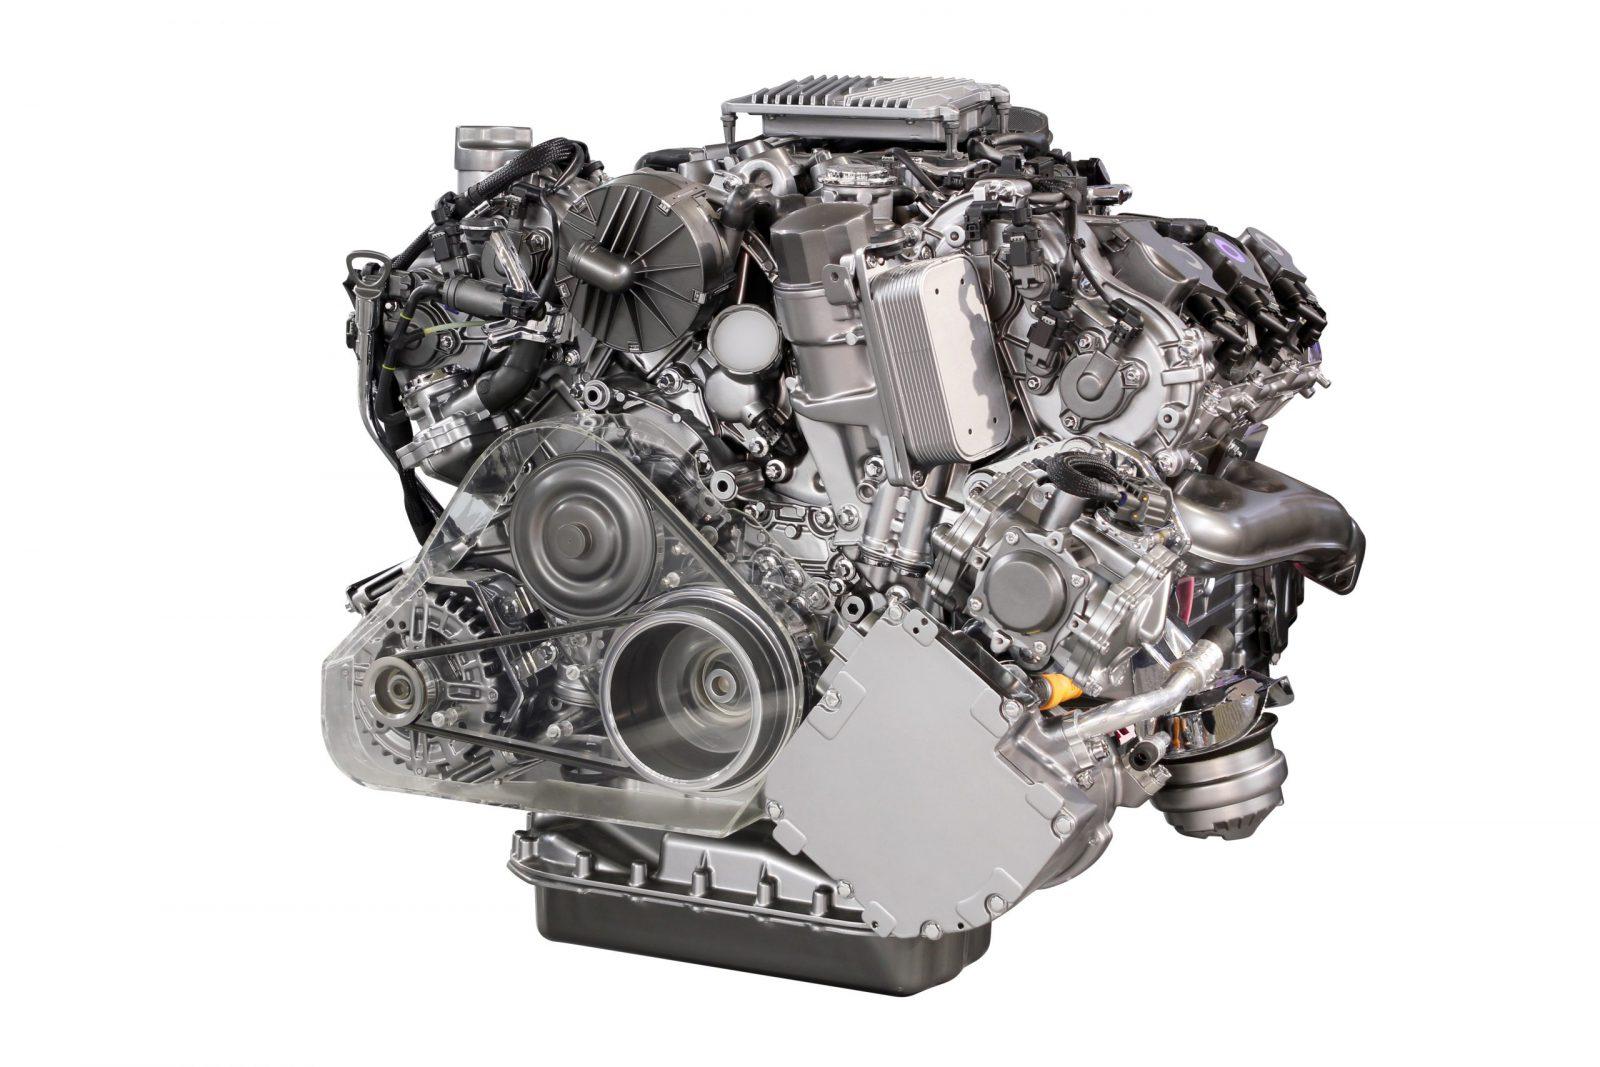 powerful car engine isolated on white